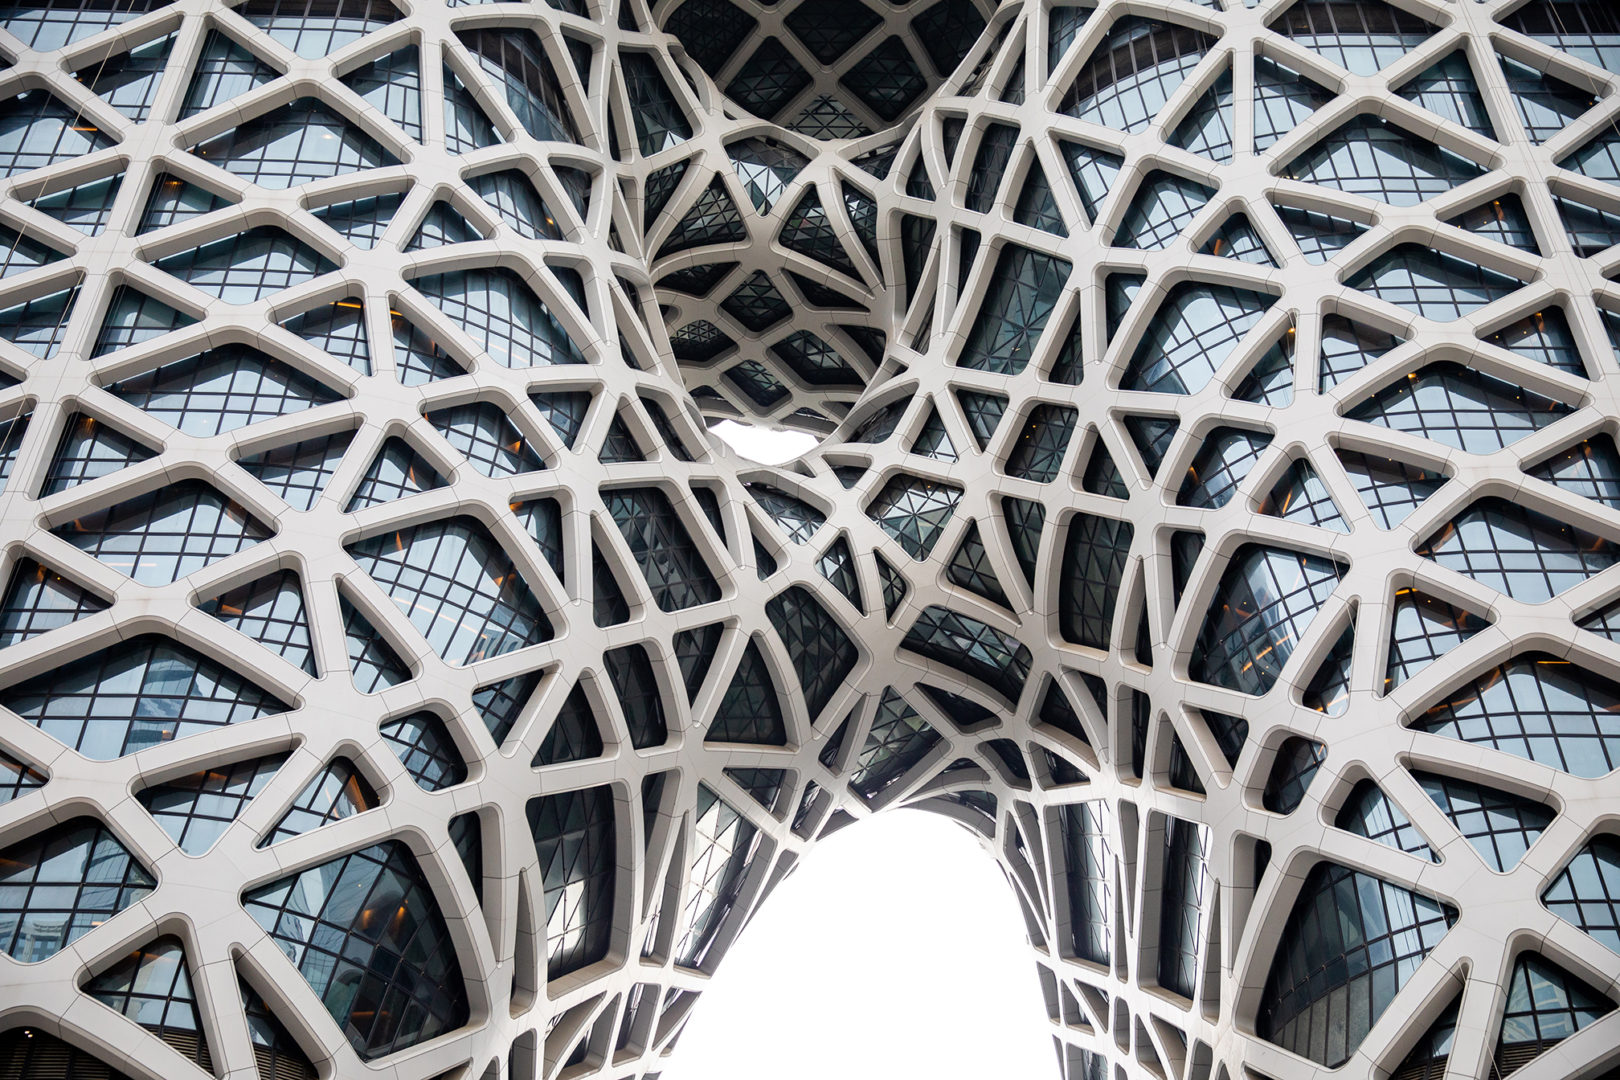 Zaha Hadid Morpheus Hotel at City of Dreams